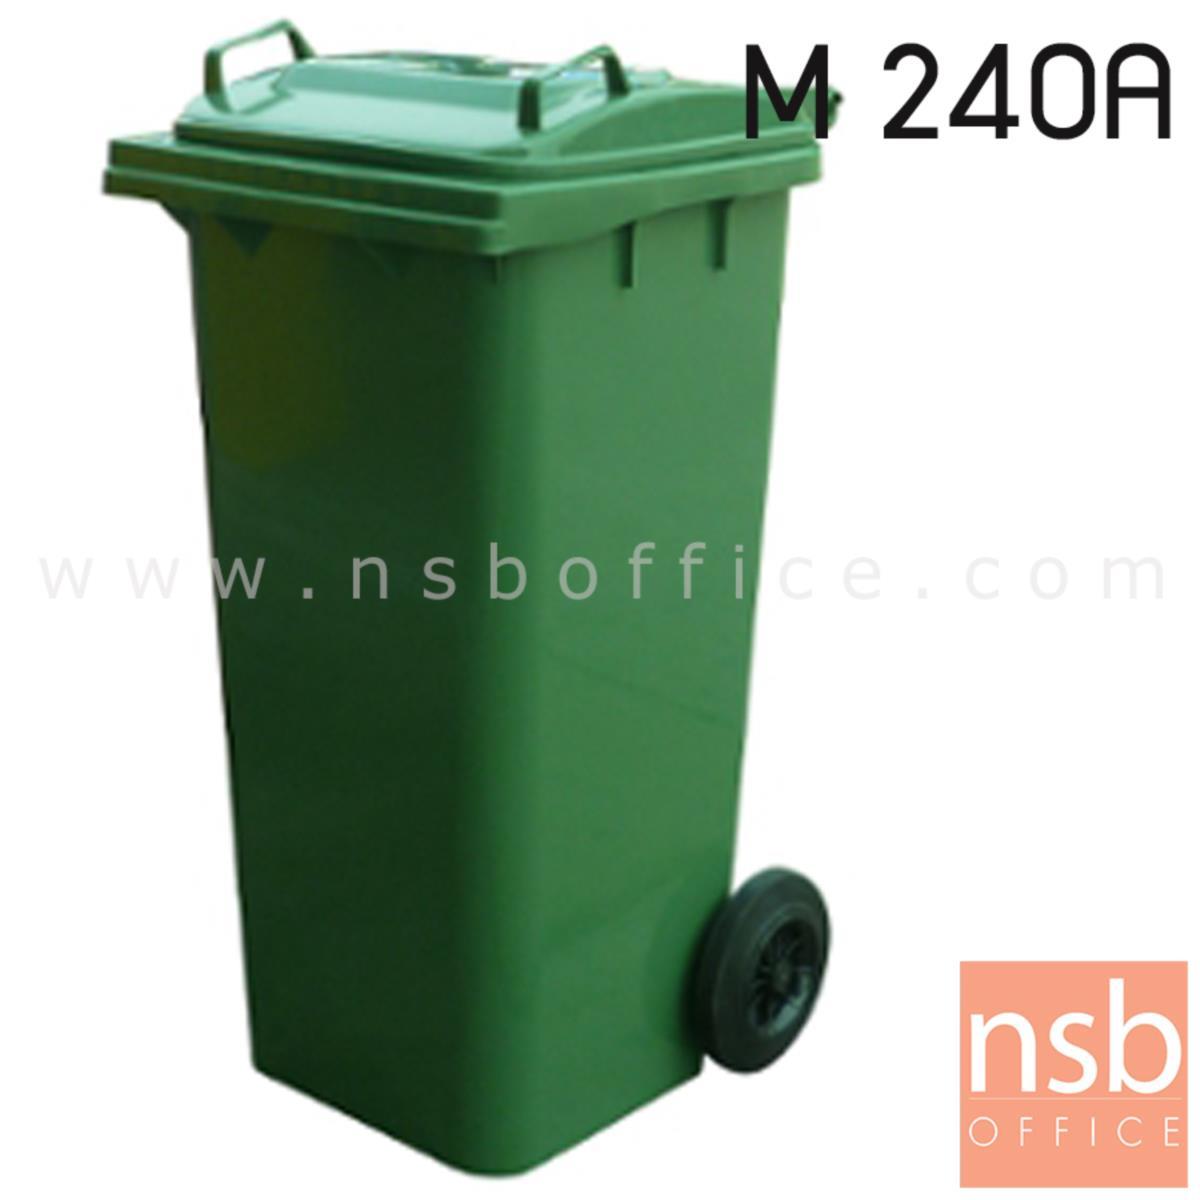 G09A013:ถังขยะพลาสติกรุ่นฝาปิดสนิท ความจุ 240 ลิตร M-240A